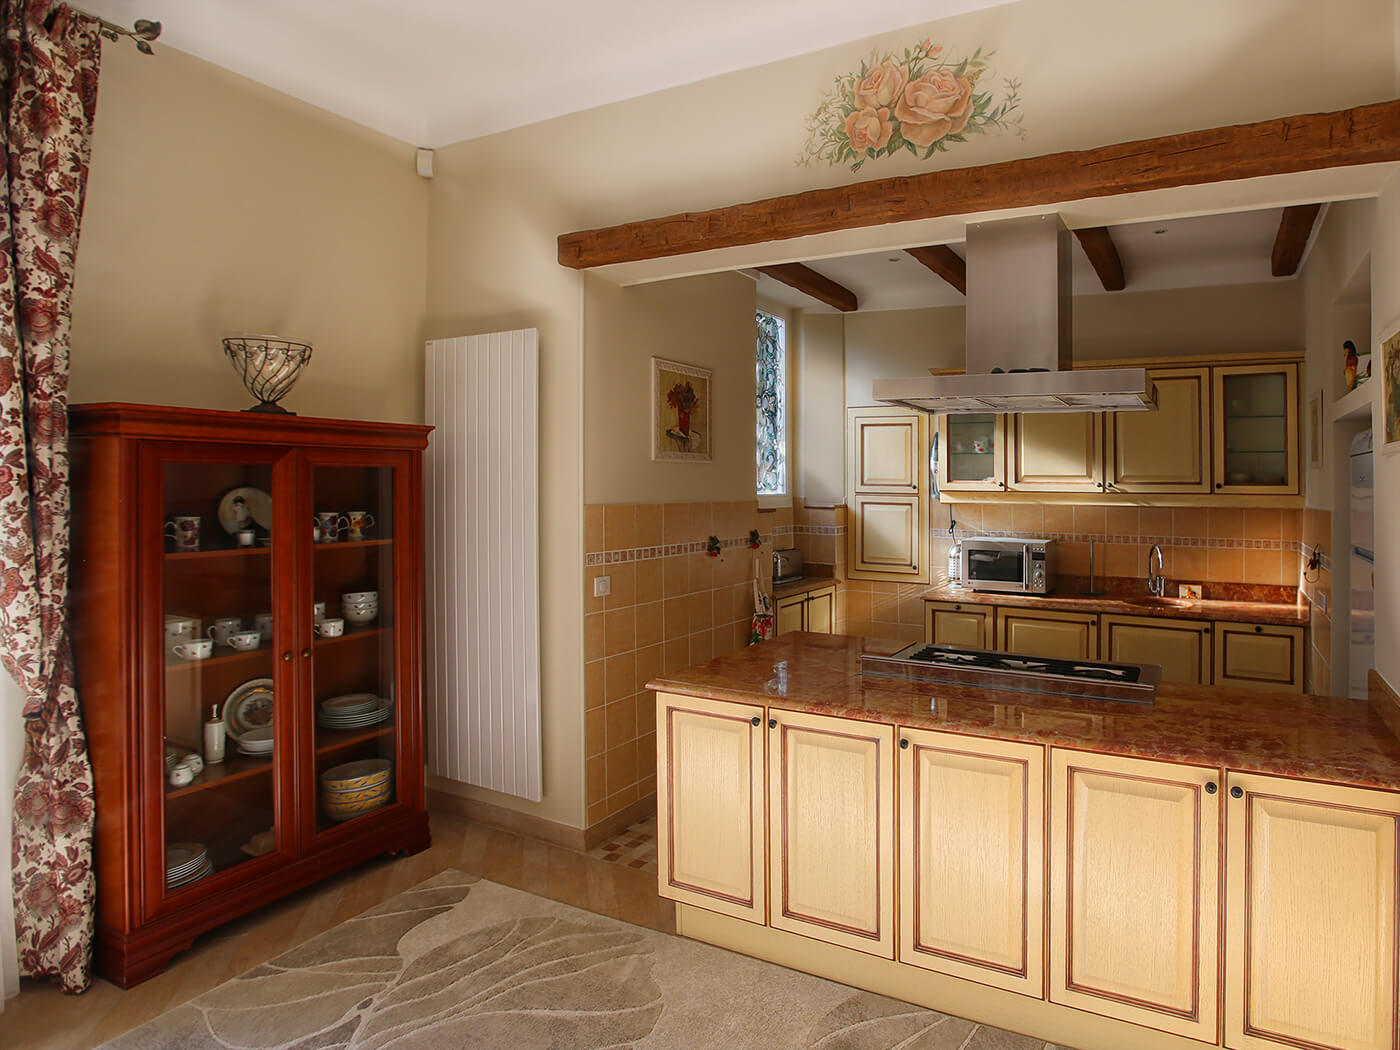 Kitchen-2-300ka